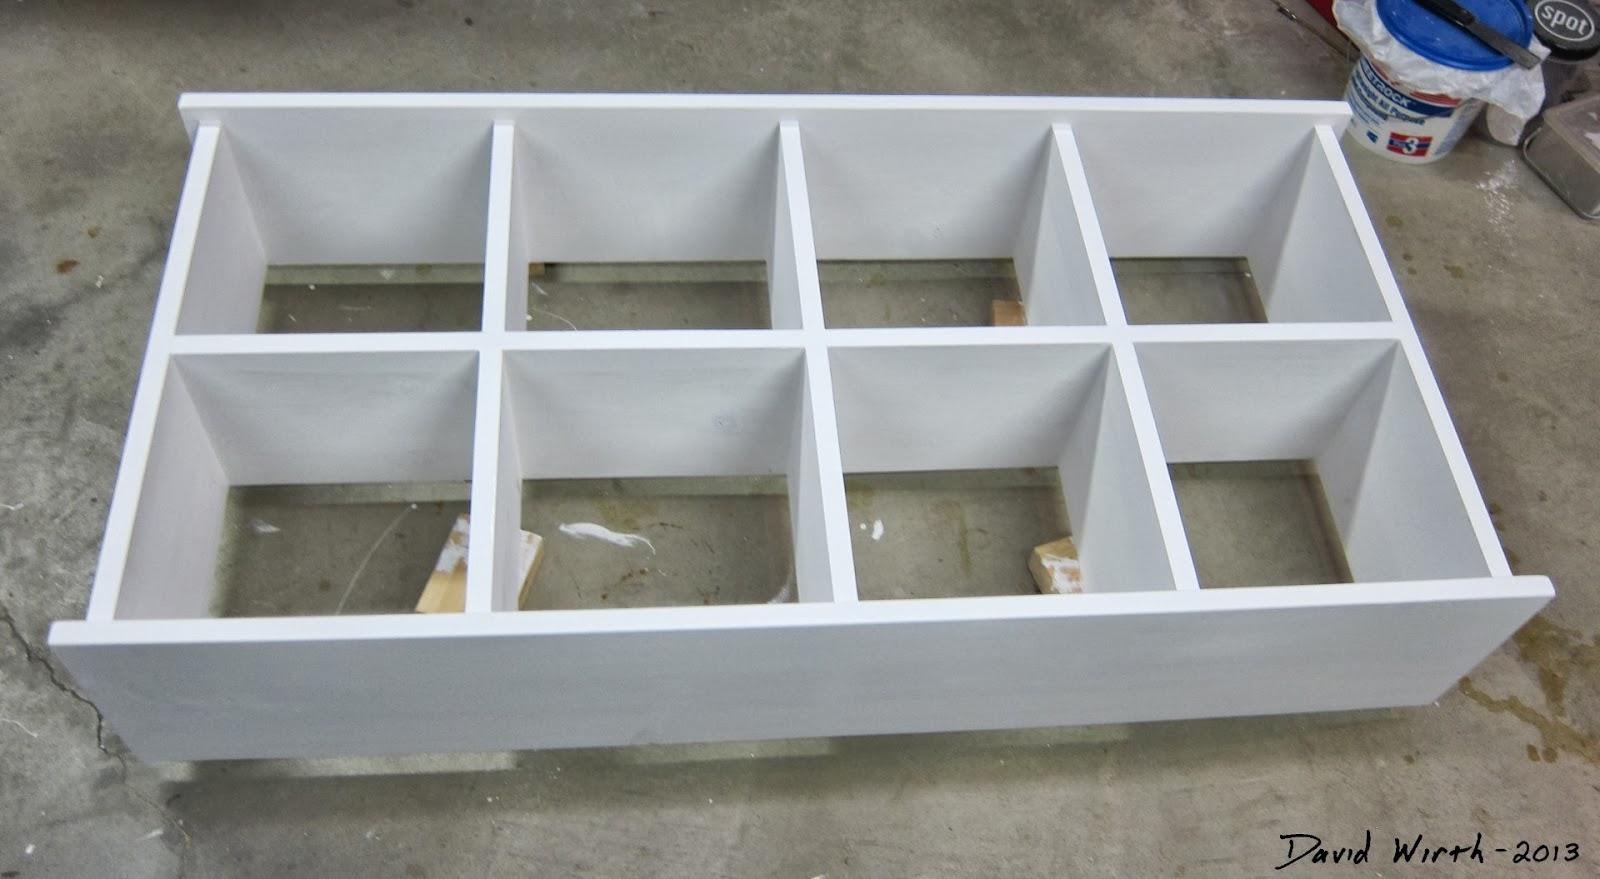 Wood Cube Shelf, Walls Mount Shelf Plans, Build, Make